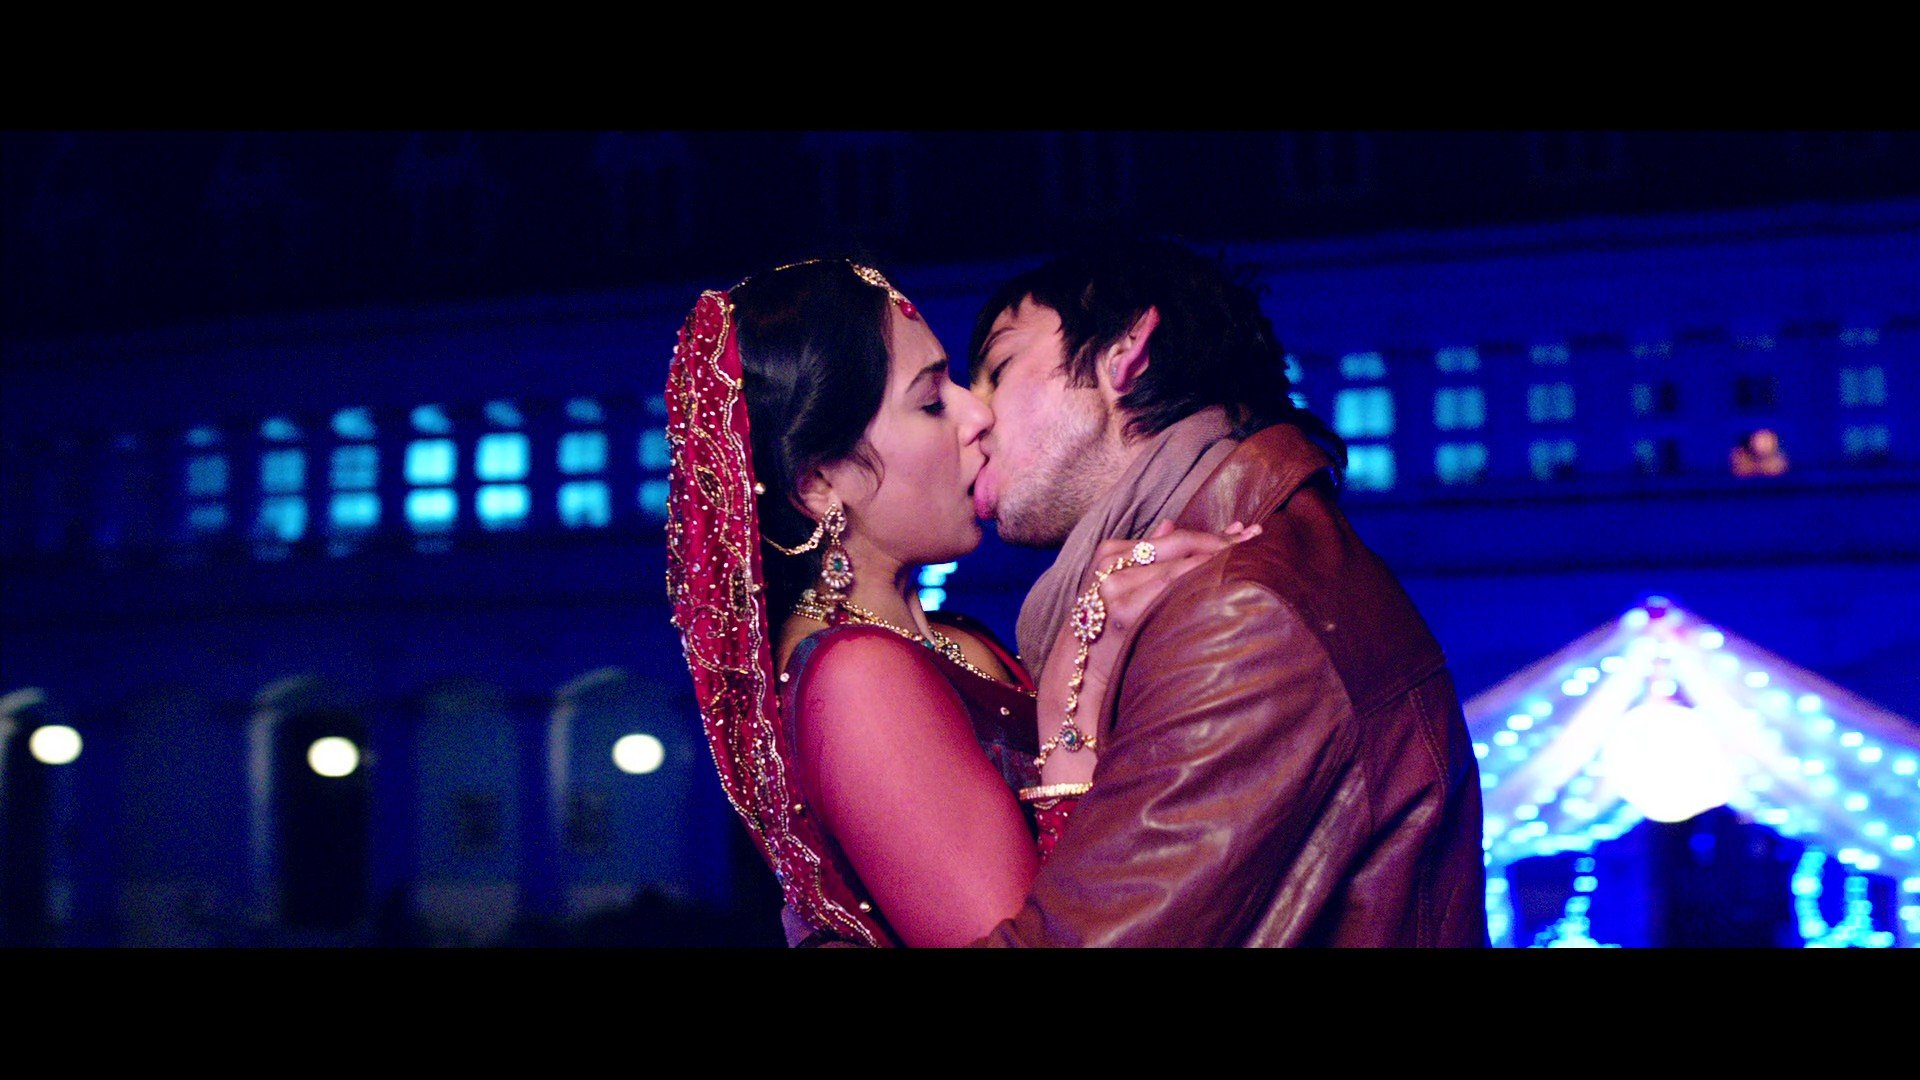 Hd wallpaper yaariyan - Yaariyan Drama Romance Bollywood 2 Wallpaper 1920x1080 378306 Wallpaperup